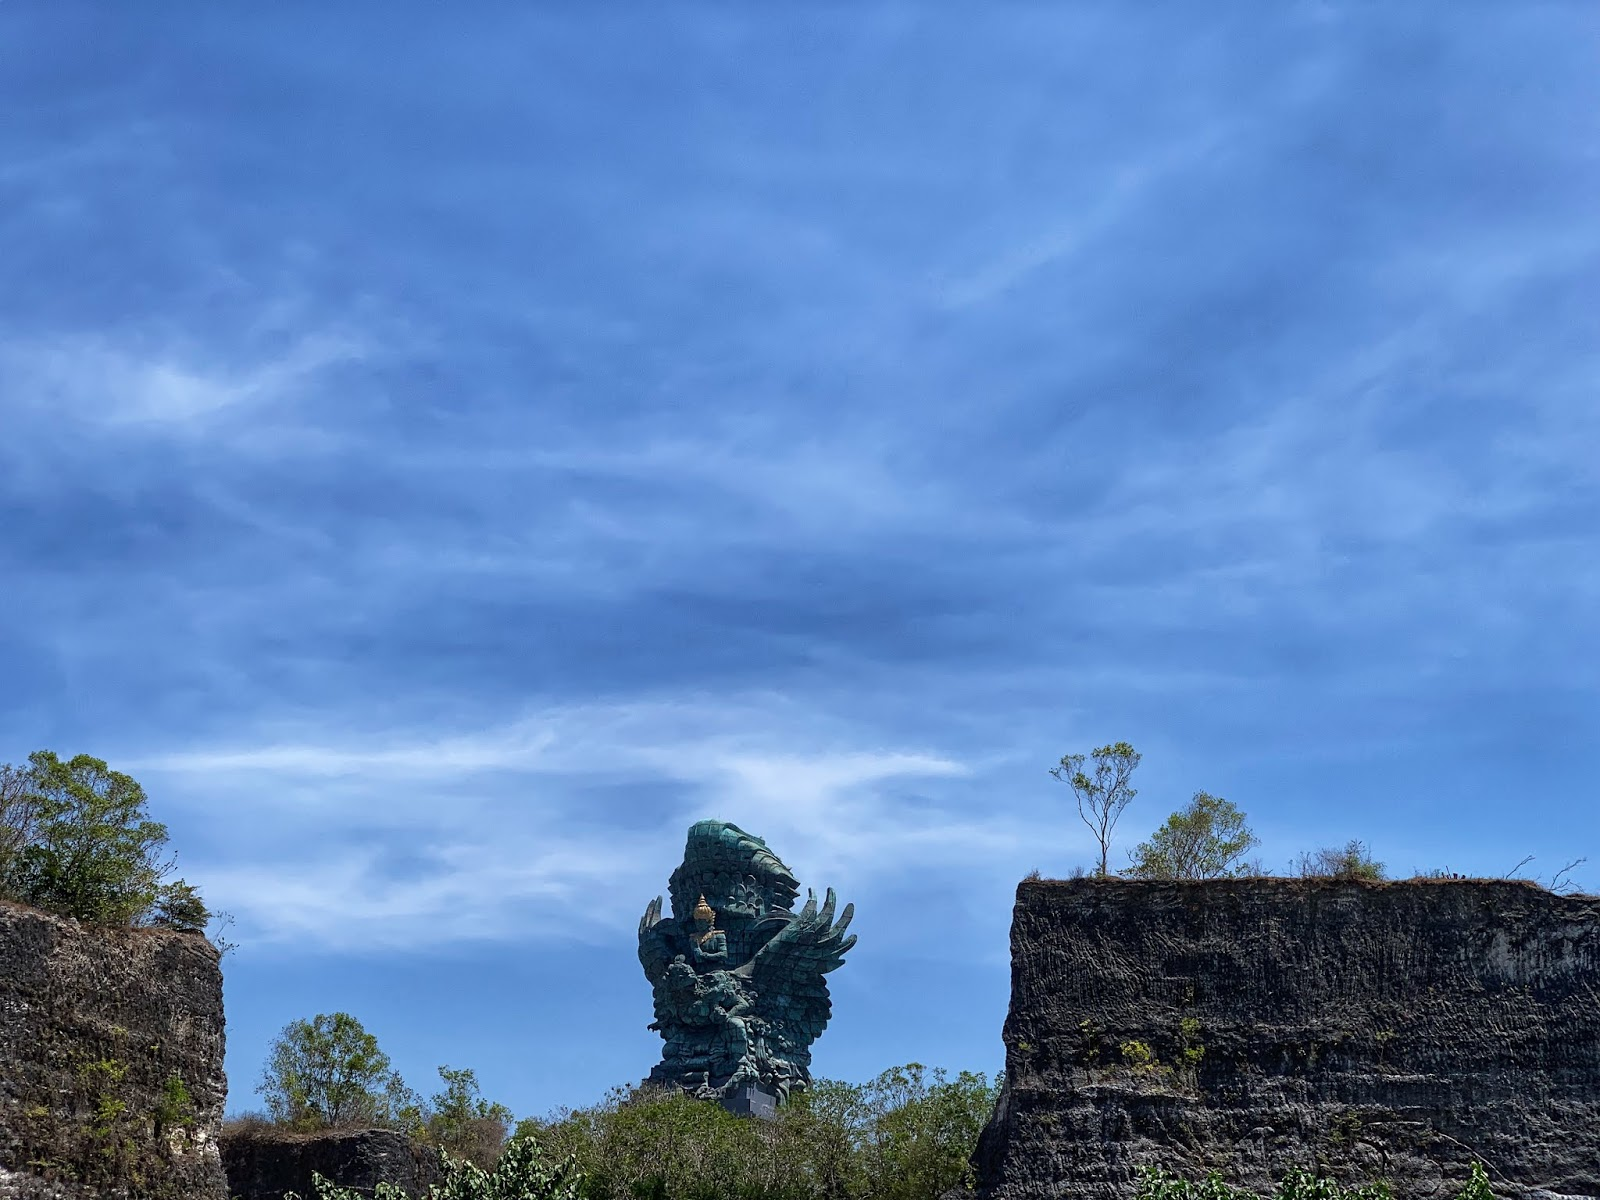 Garuda-Wisnu-Kencana-Cultural-Park